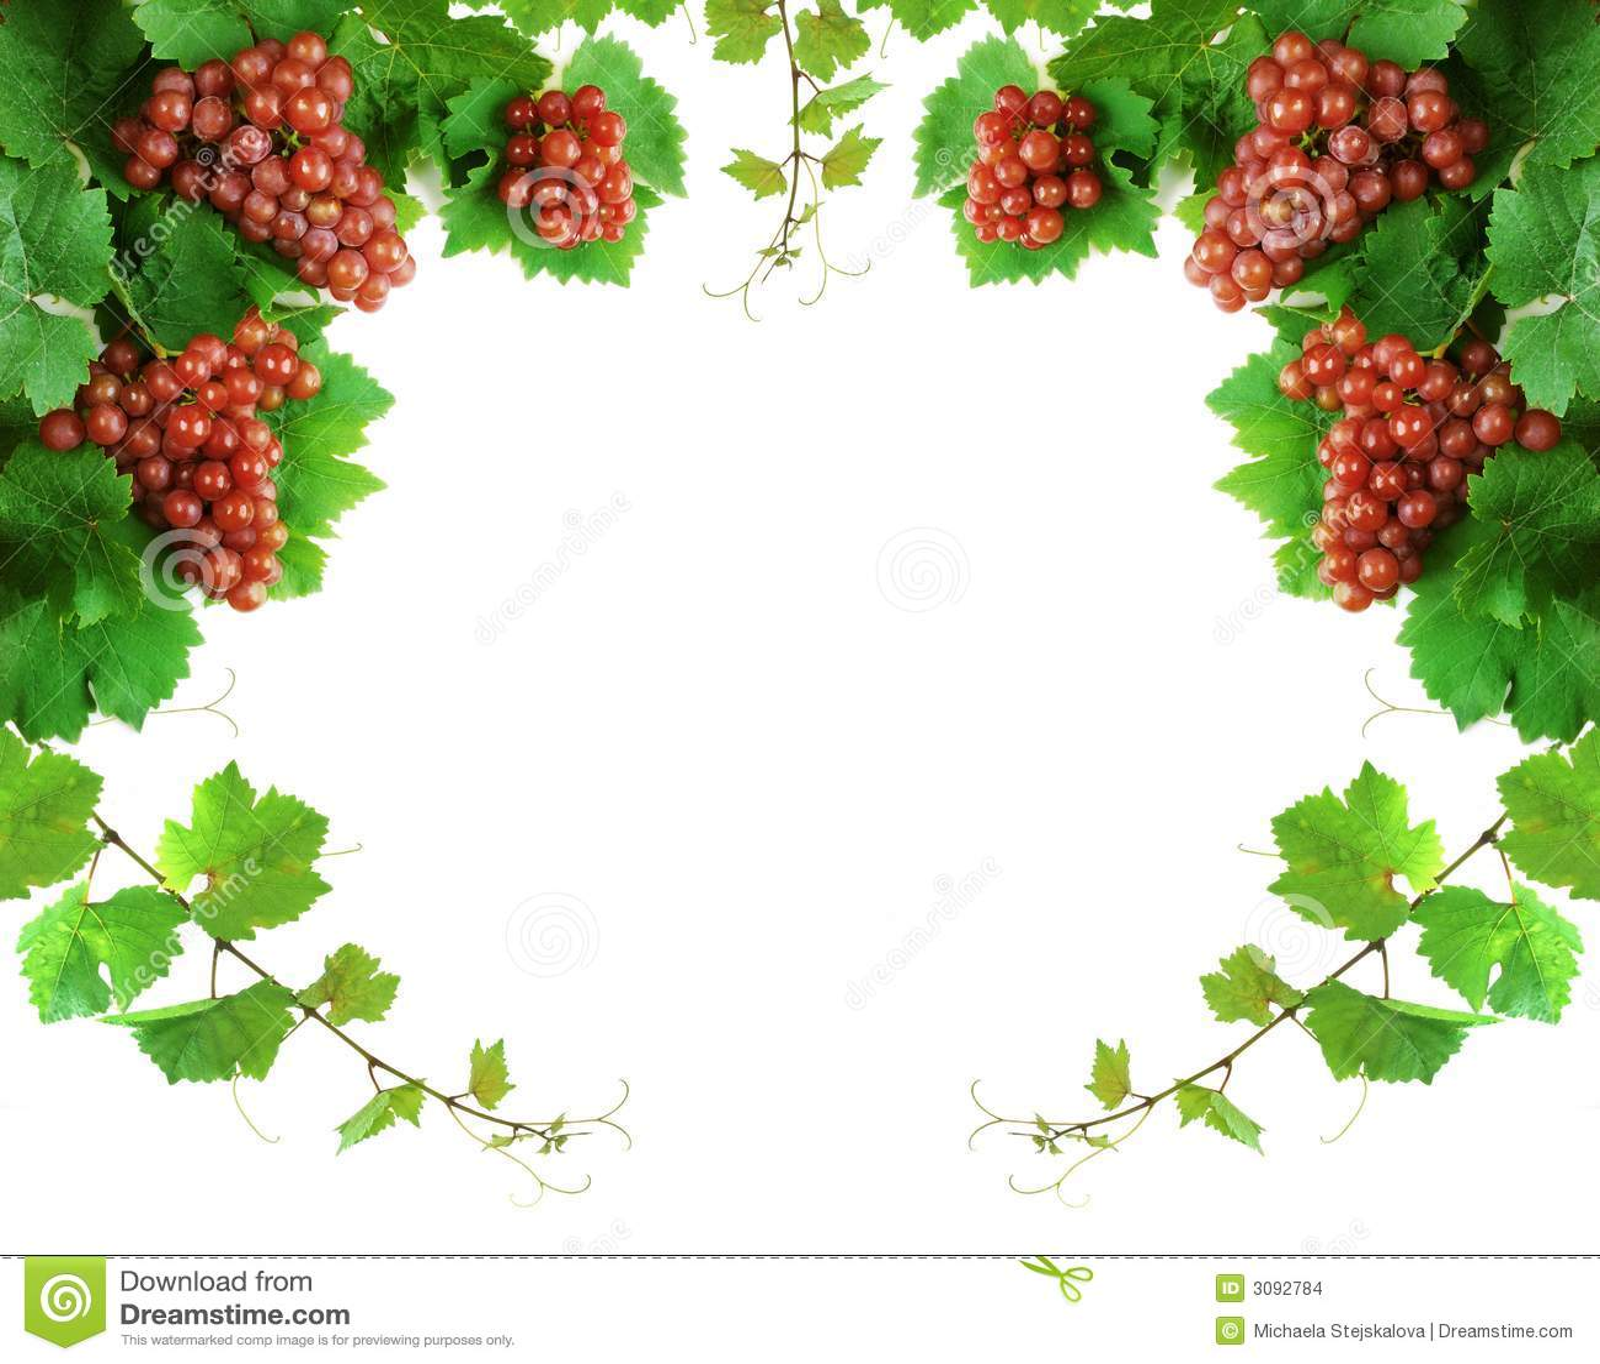 Grapevine Decoration Border Stock Images - Image: 3092784